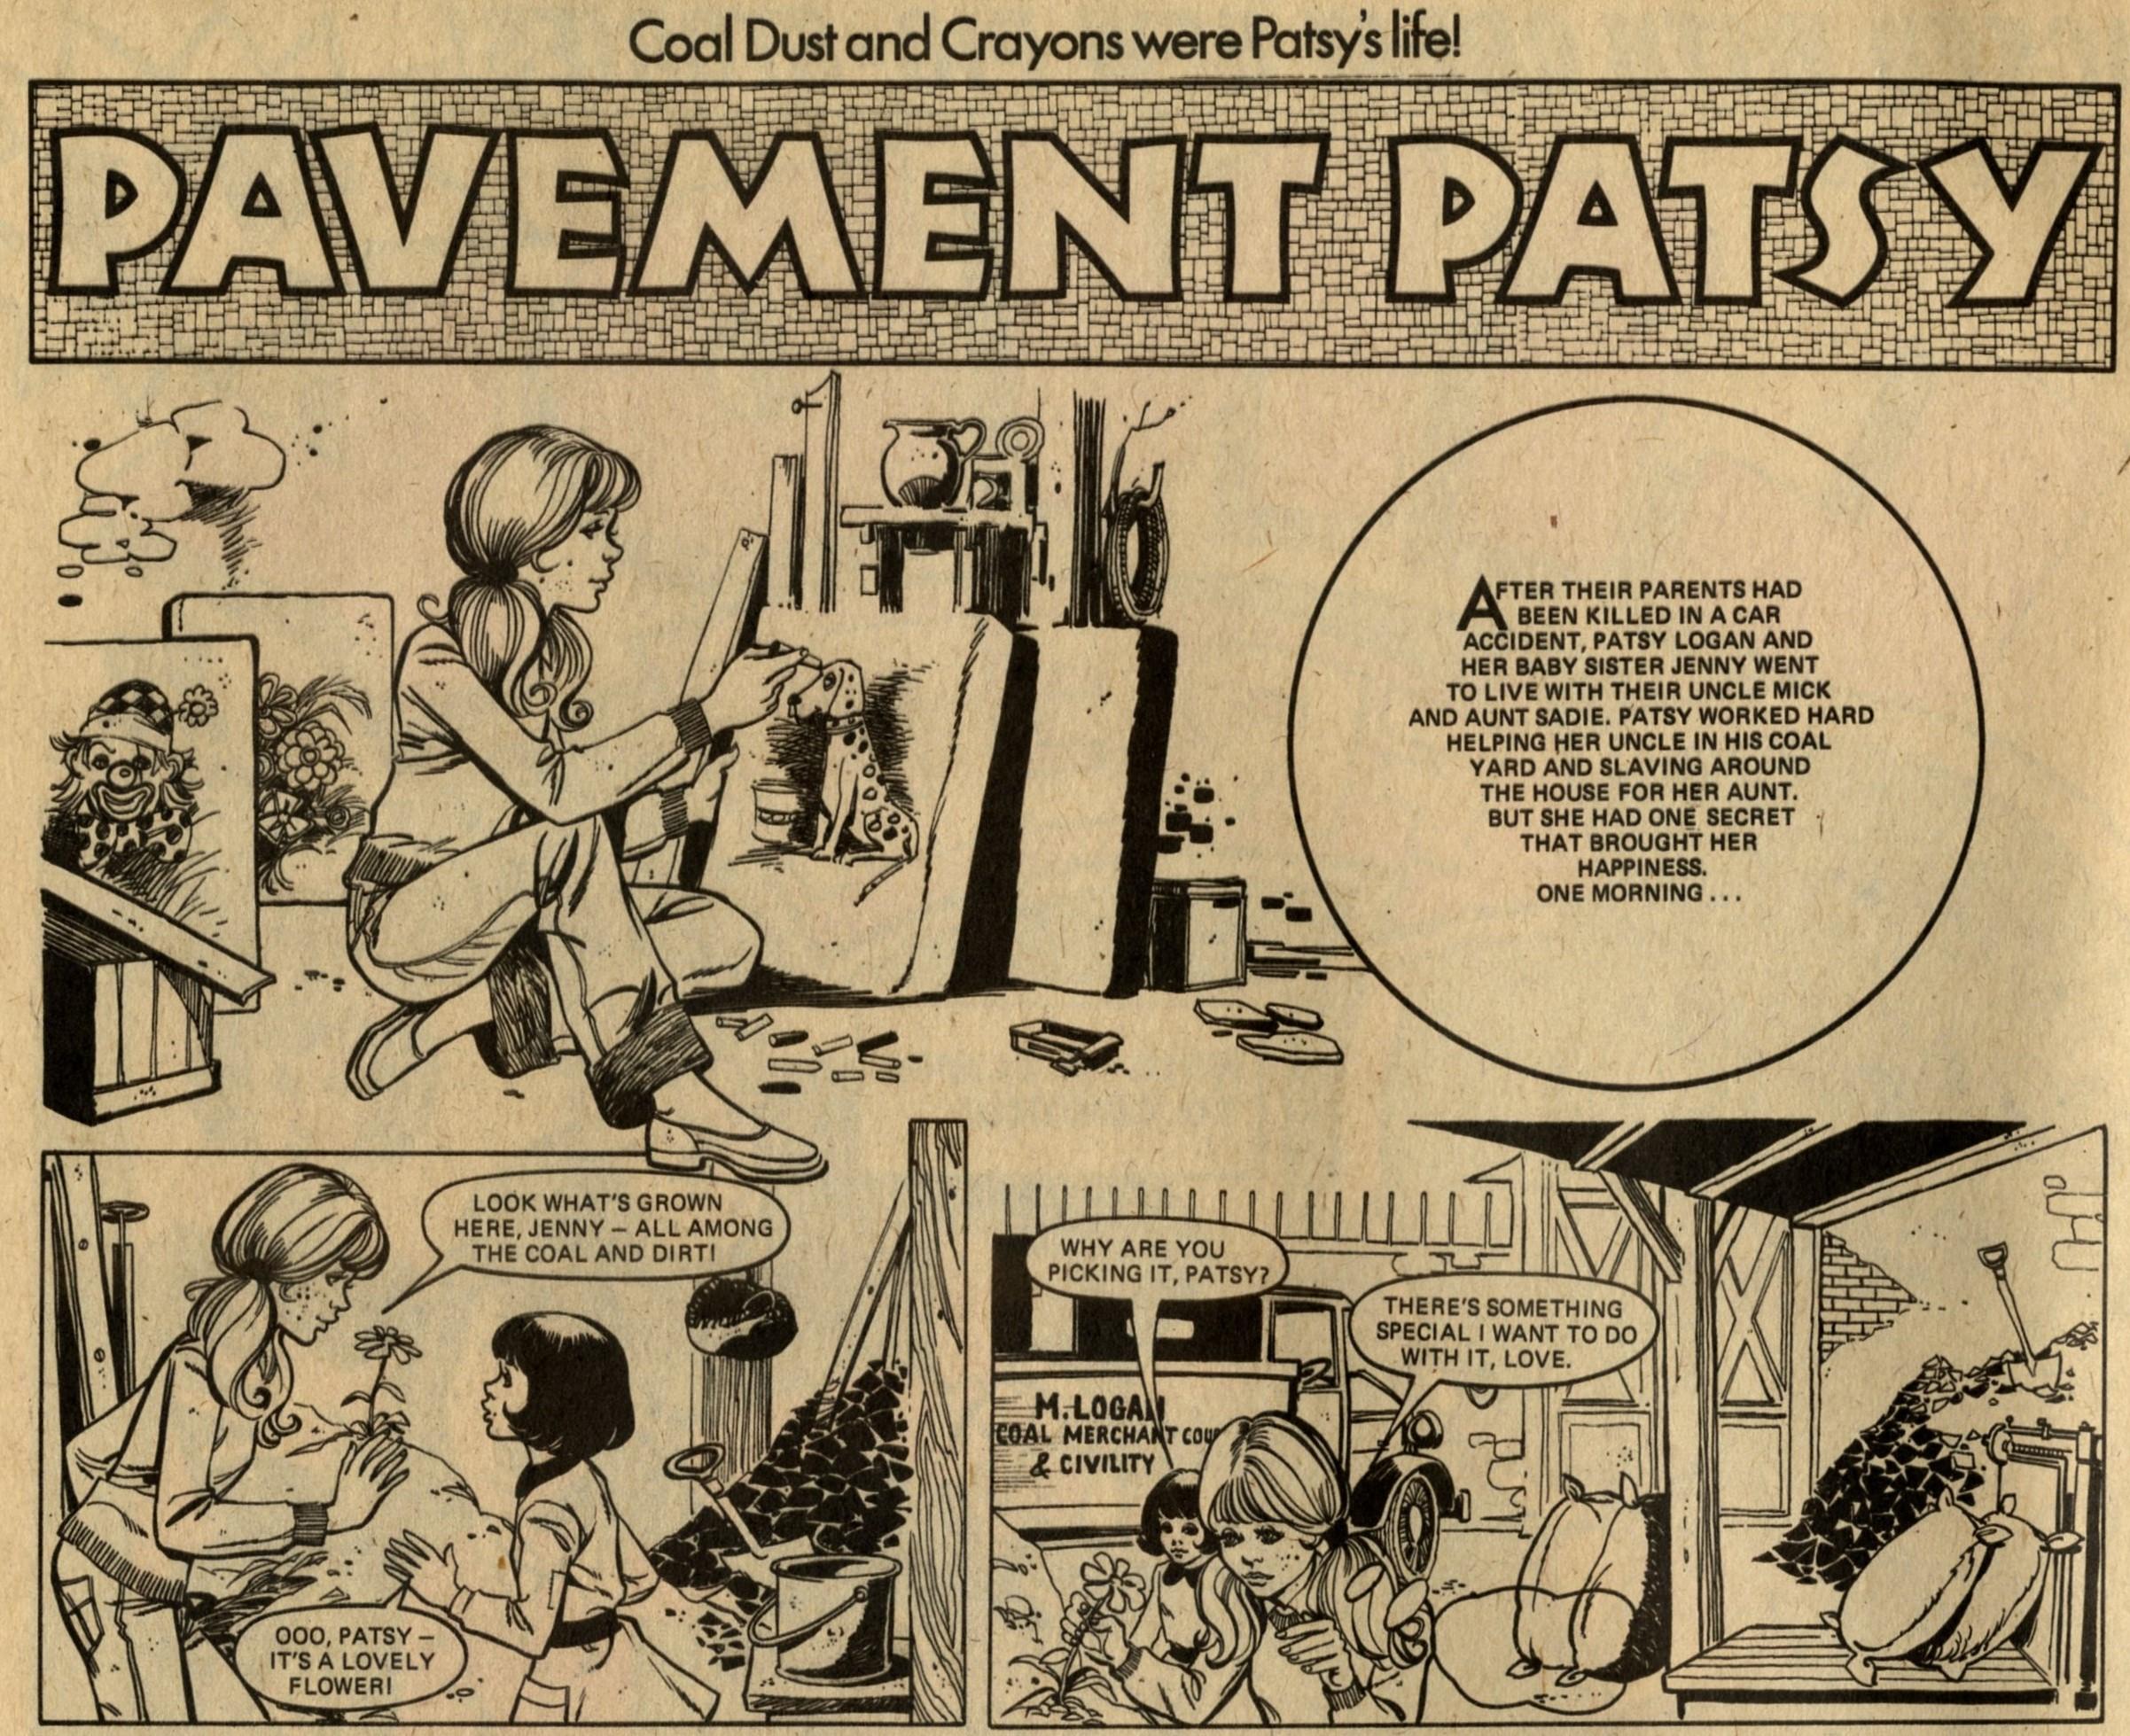 Pavement Patsy: Miguel Quesada (artist)